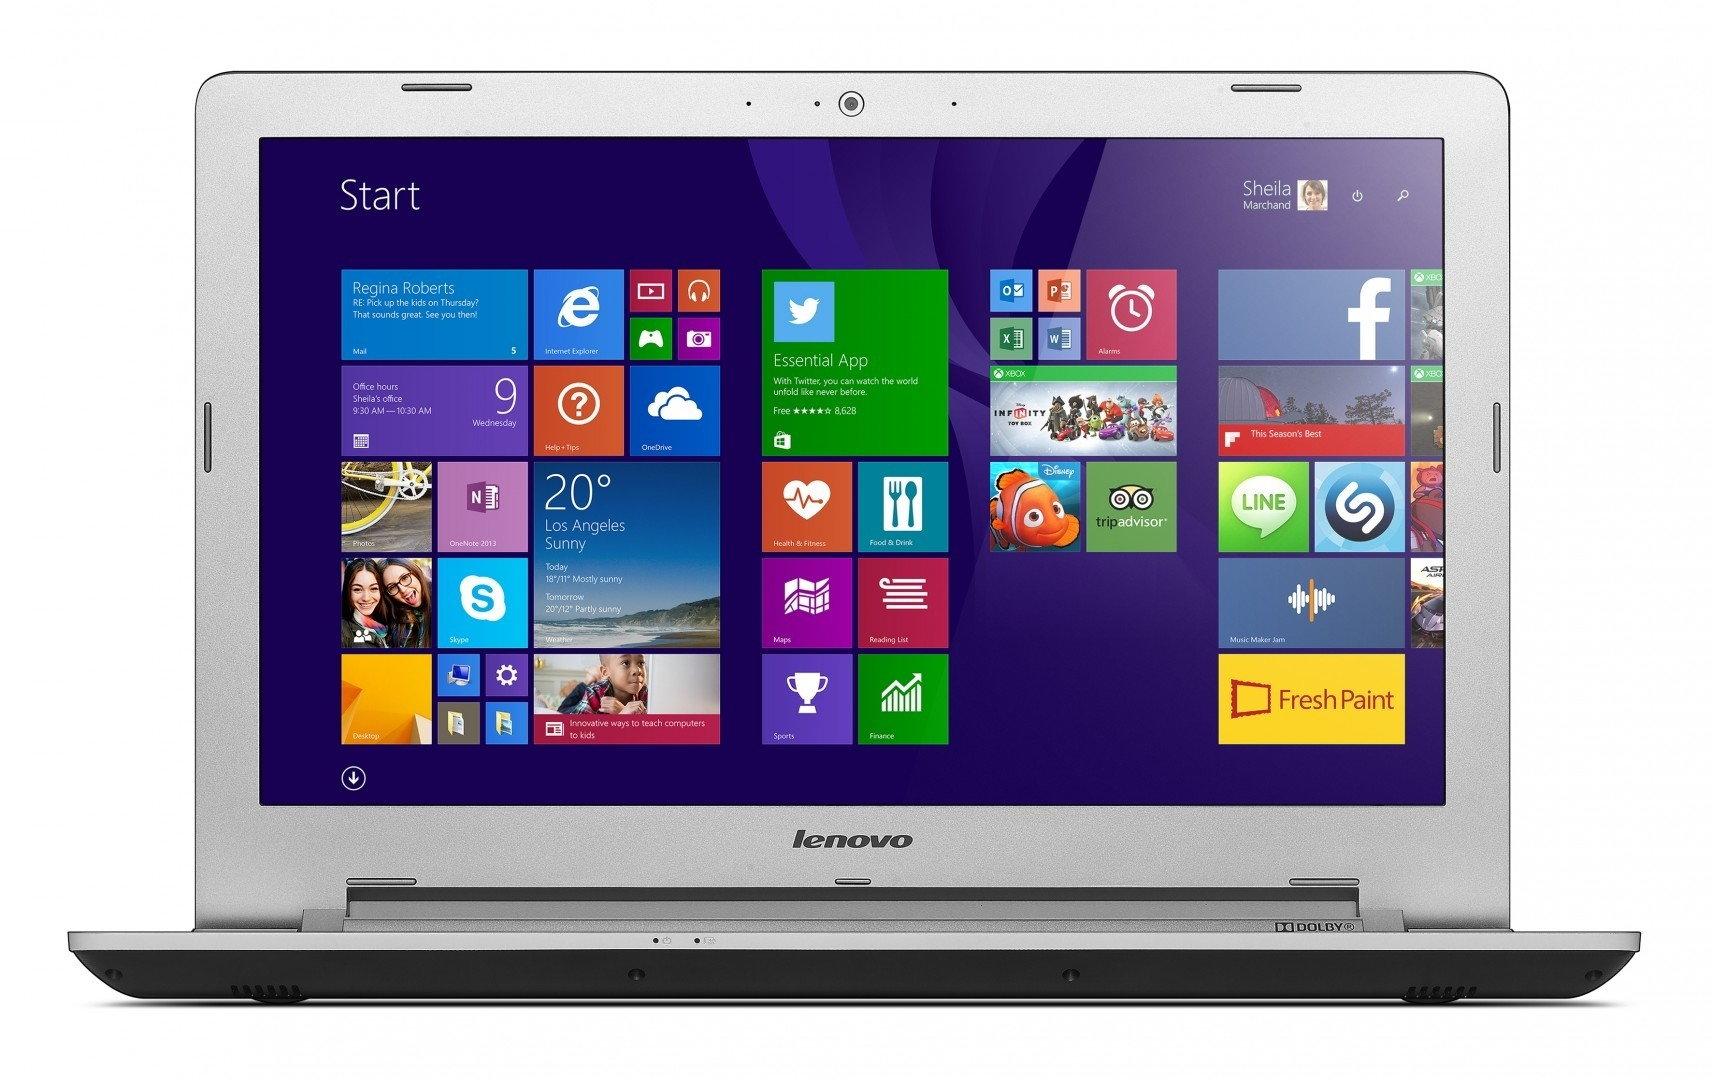 "Lenovo IdeaPad Z51-70 15,6"", Core i7 2,4GHz, 4GB RAM, 1000GB HDD + 8GB SSD (80K6018RPB)"